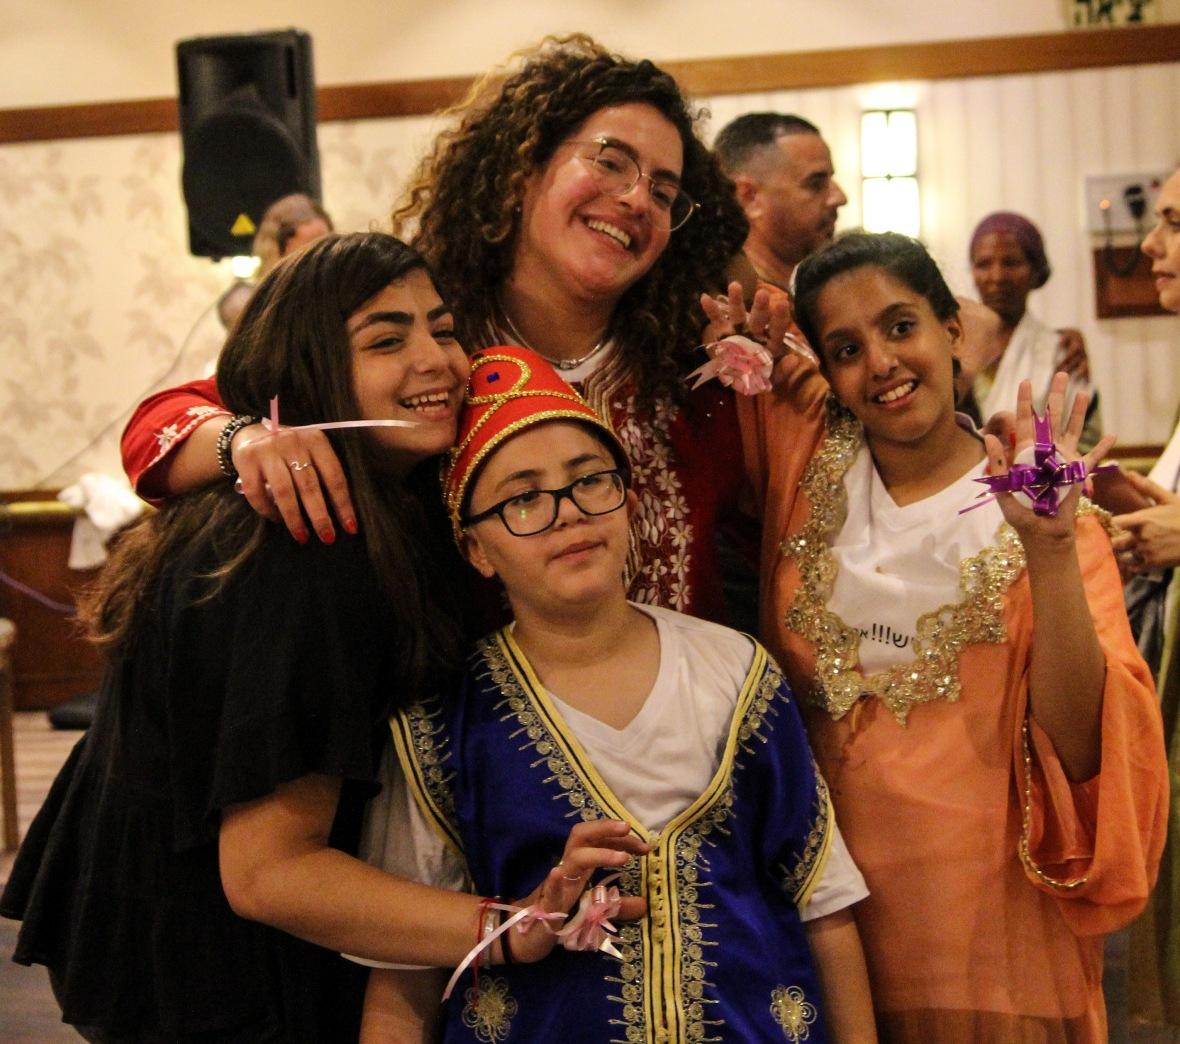 B'nai Mitzvah